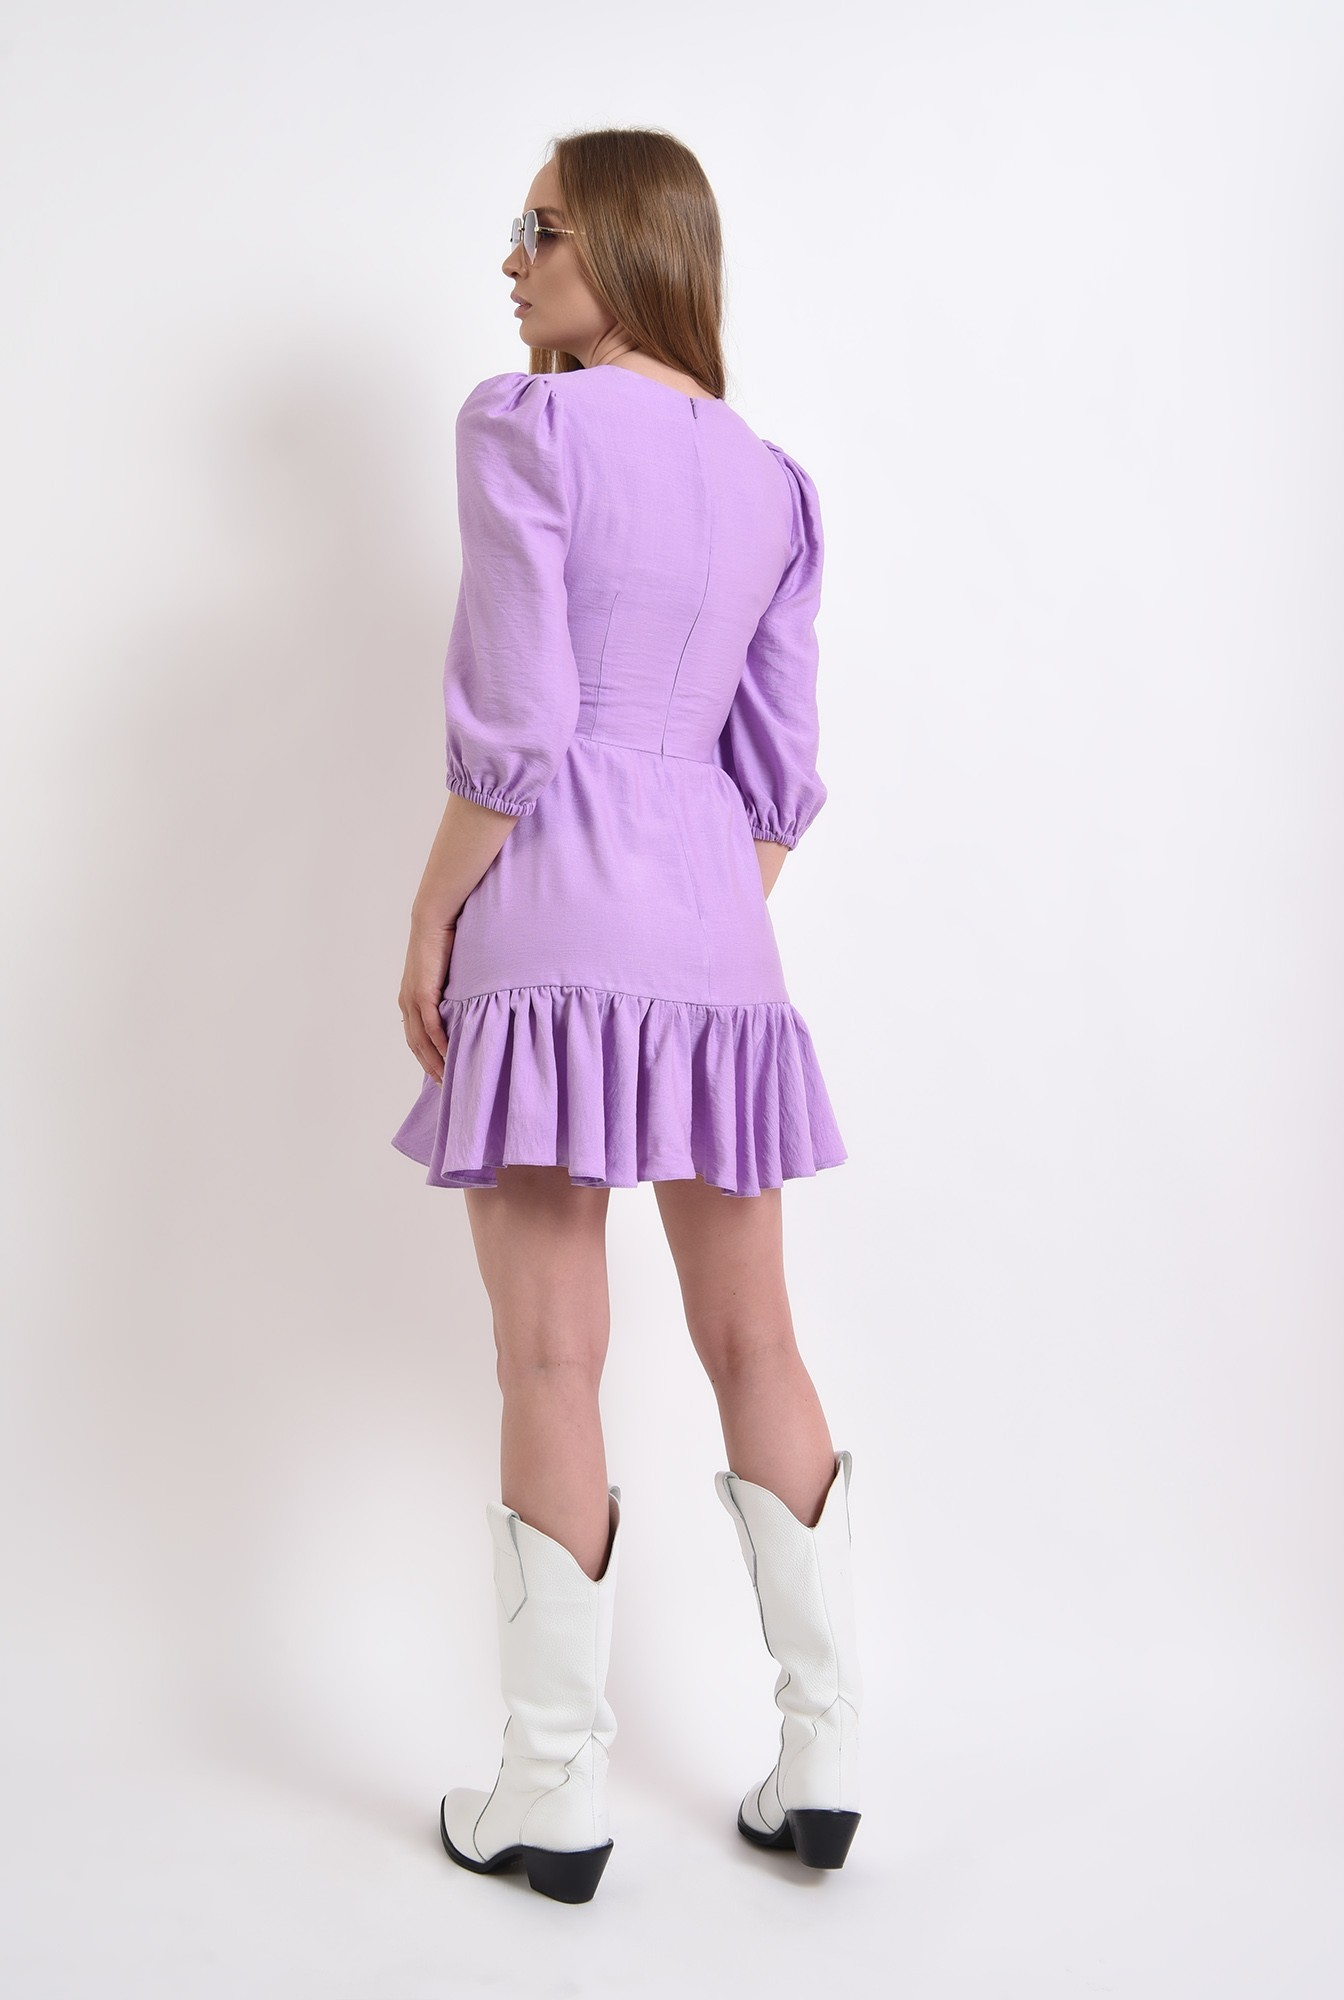 2 - rochie mini, lila, evazata, cu volan